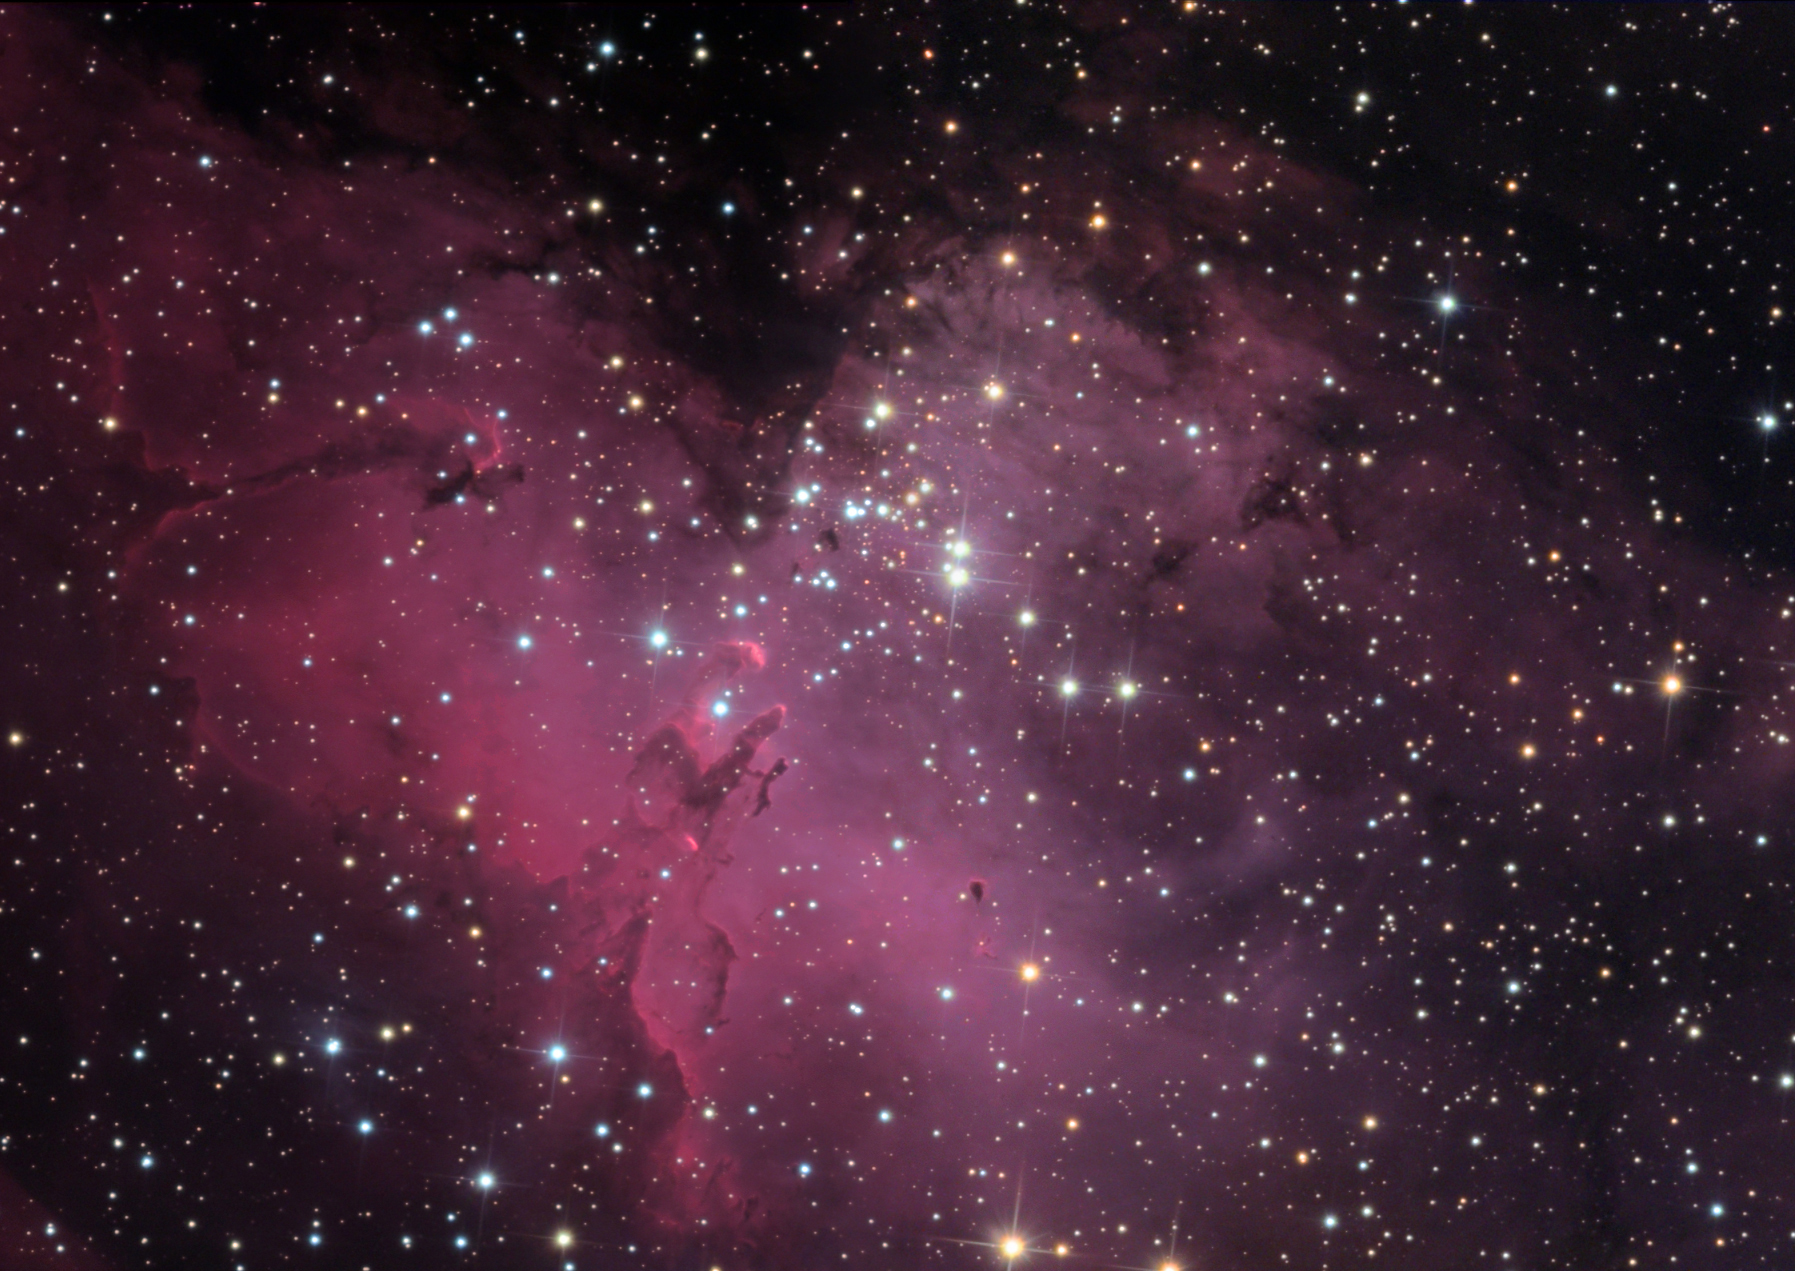 eagle nebula s - photo #20